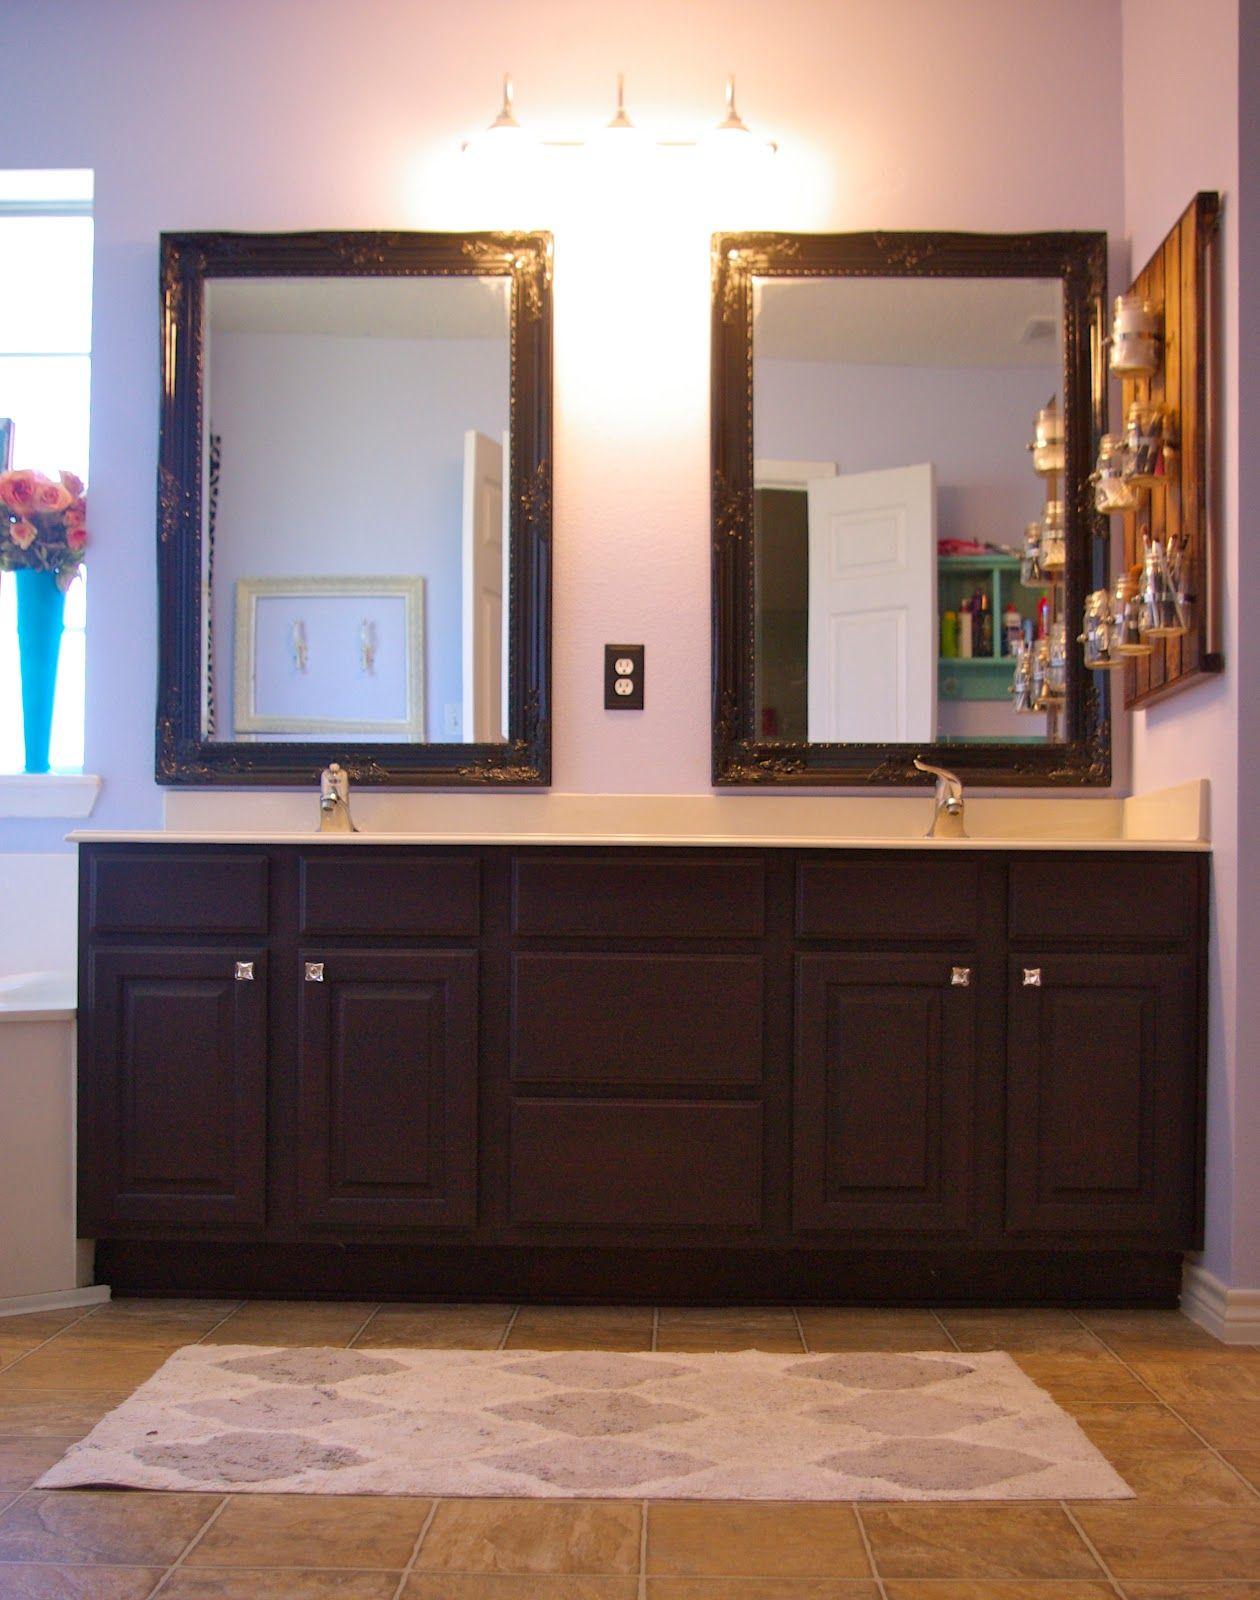 Skinny Meg: Refinished Bathroom Cabinets | Brown bathroom ...